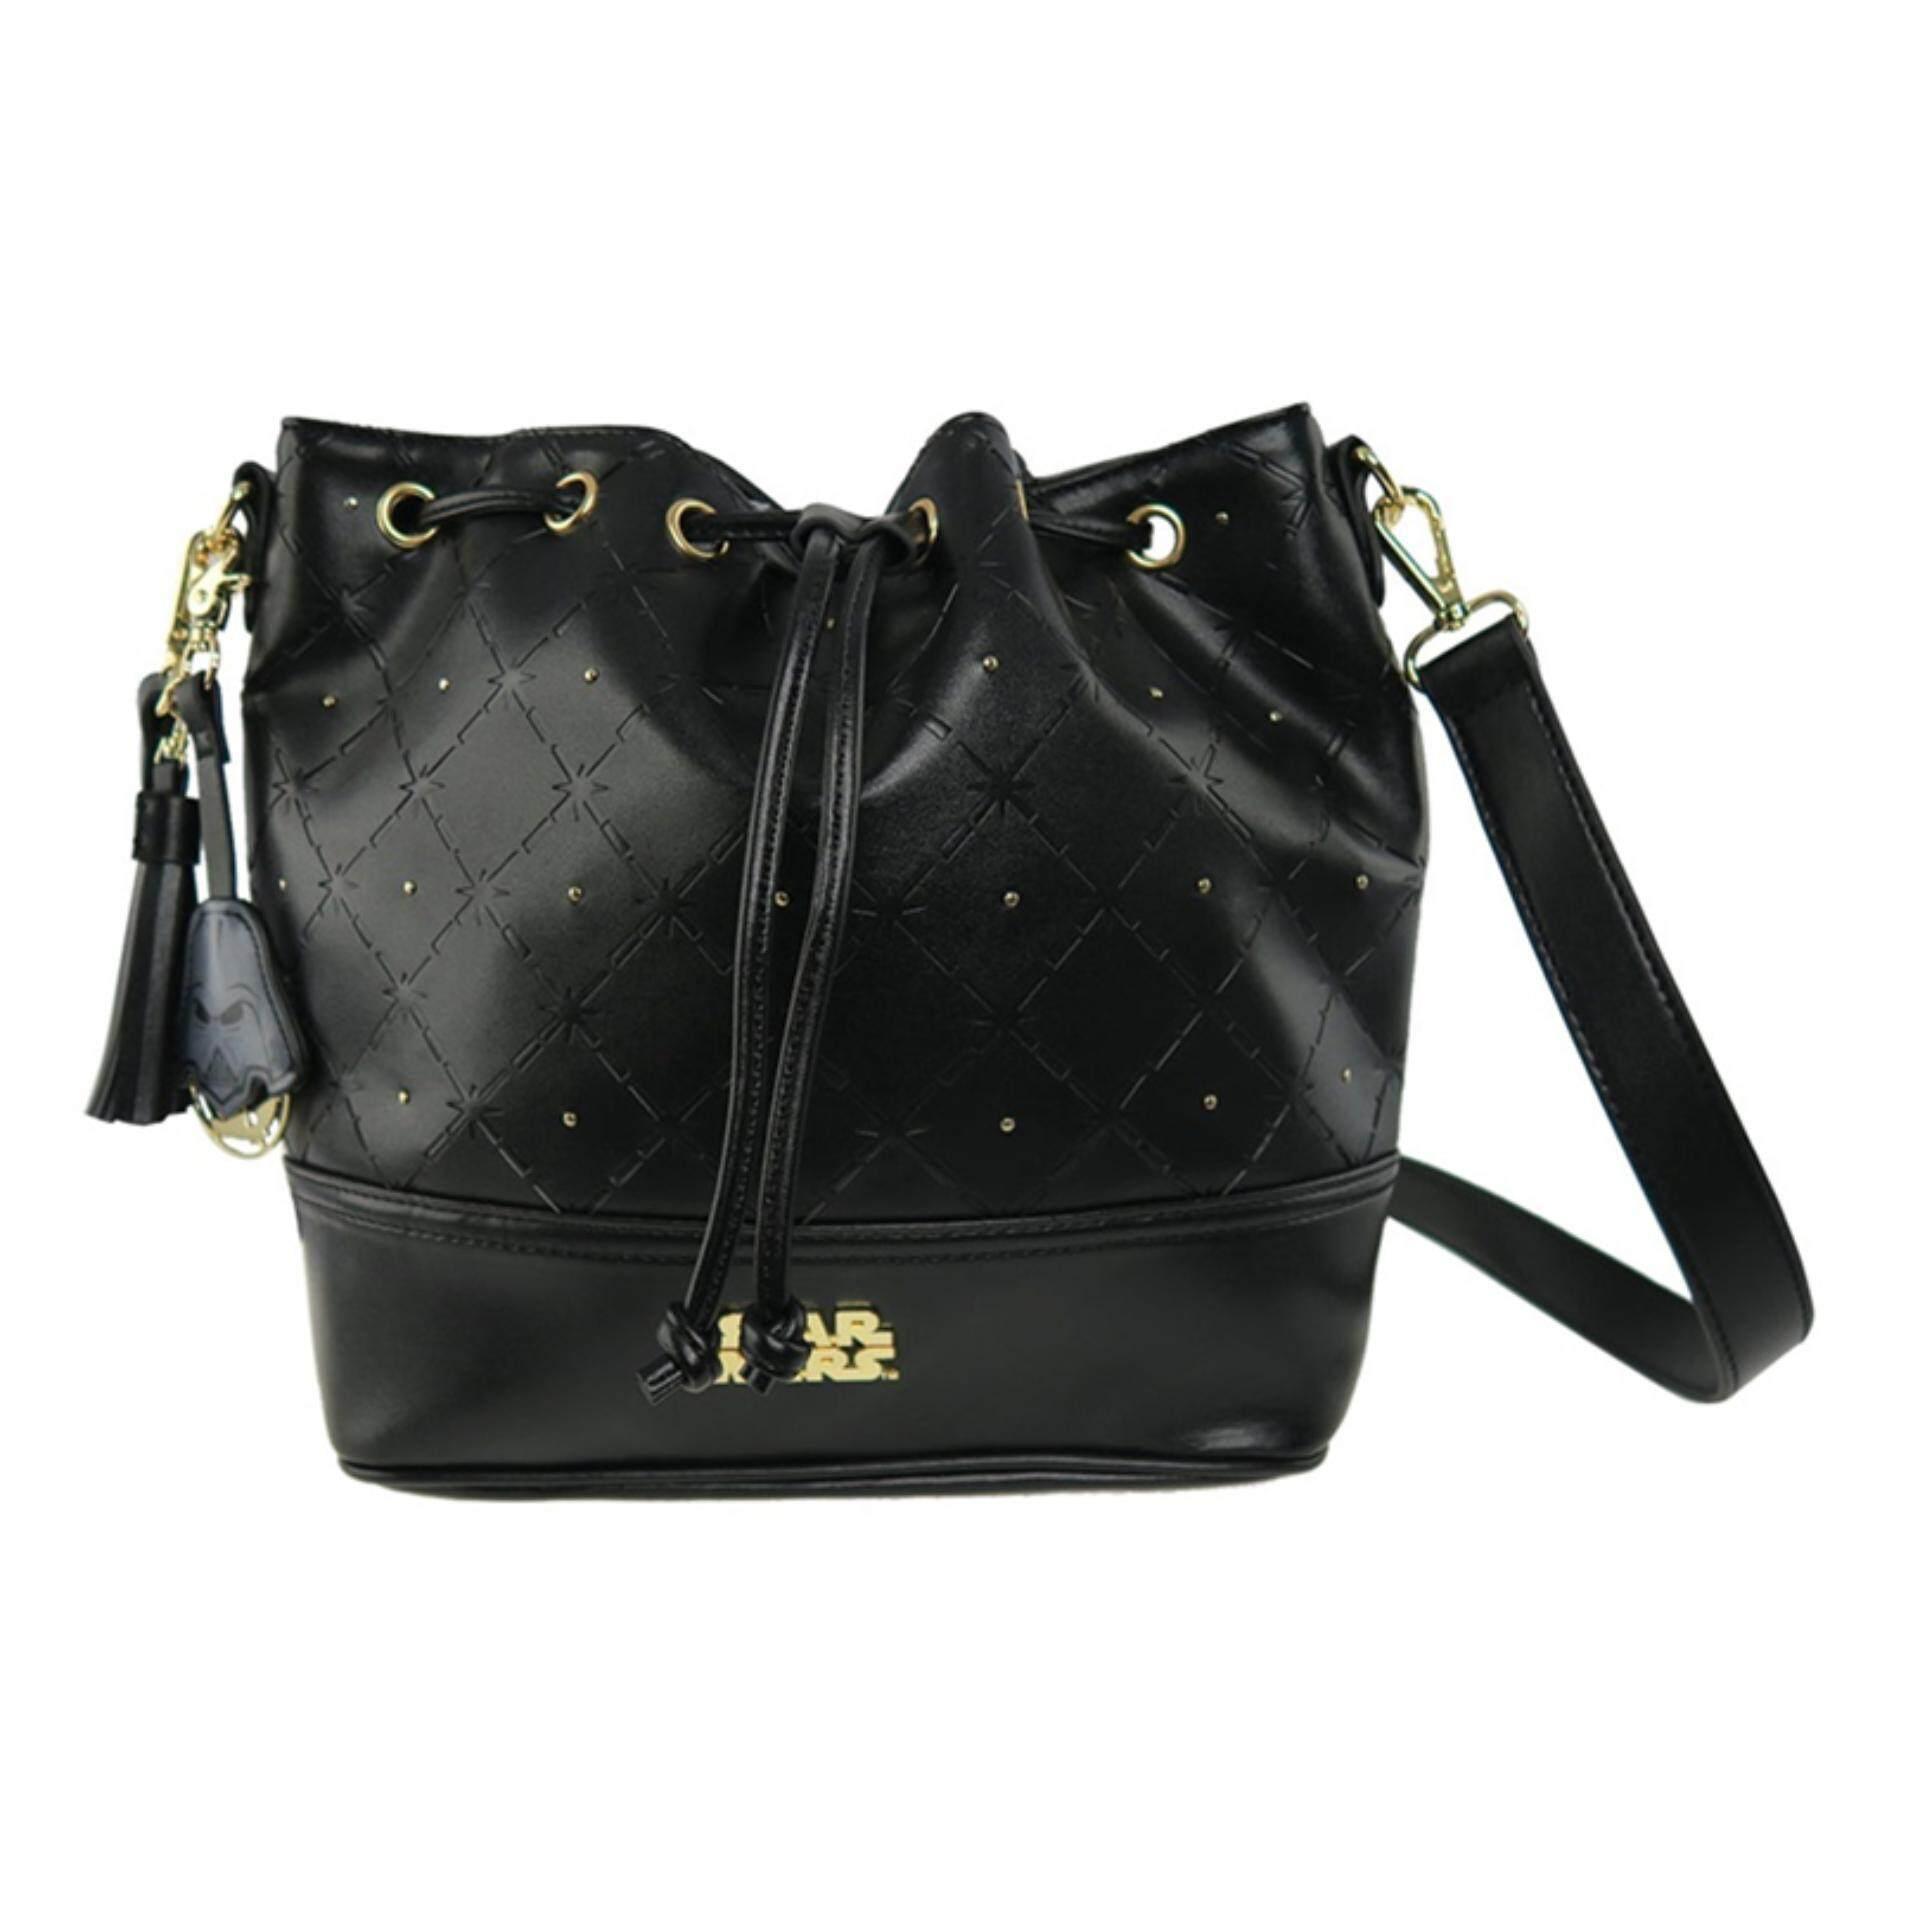 Disney Star Wars Adult Bucket Bag - Black Colour